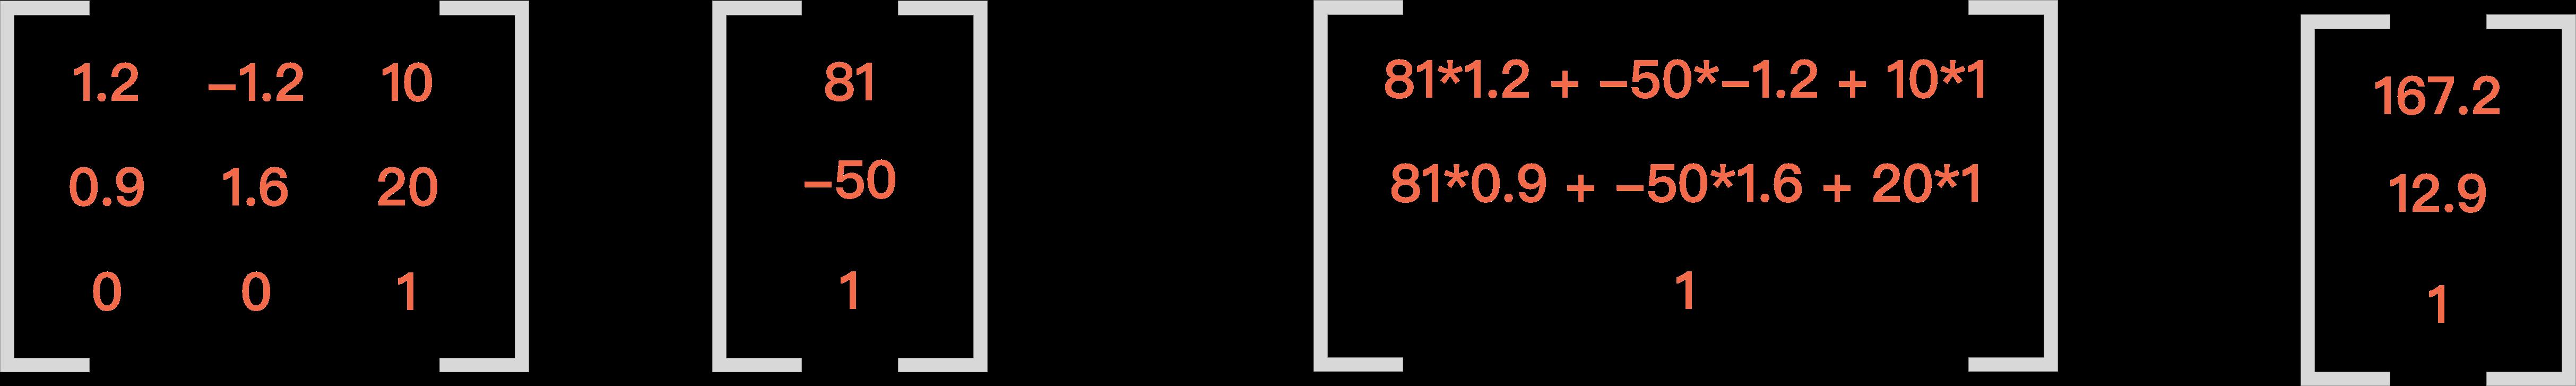 金沙棋牌官方平台 53